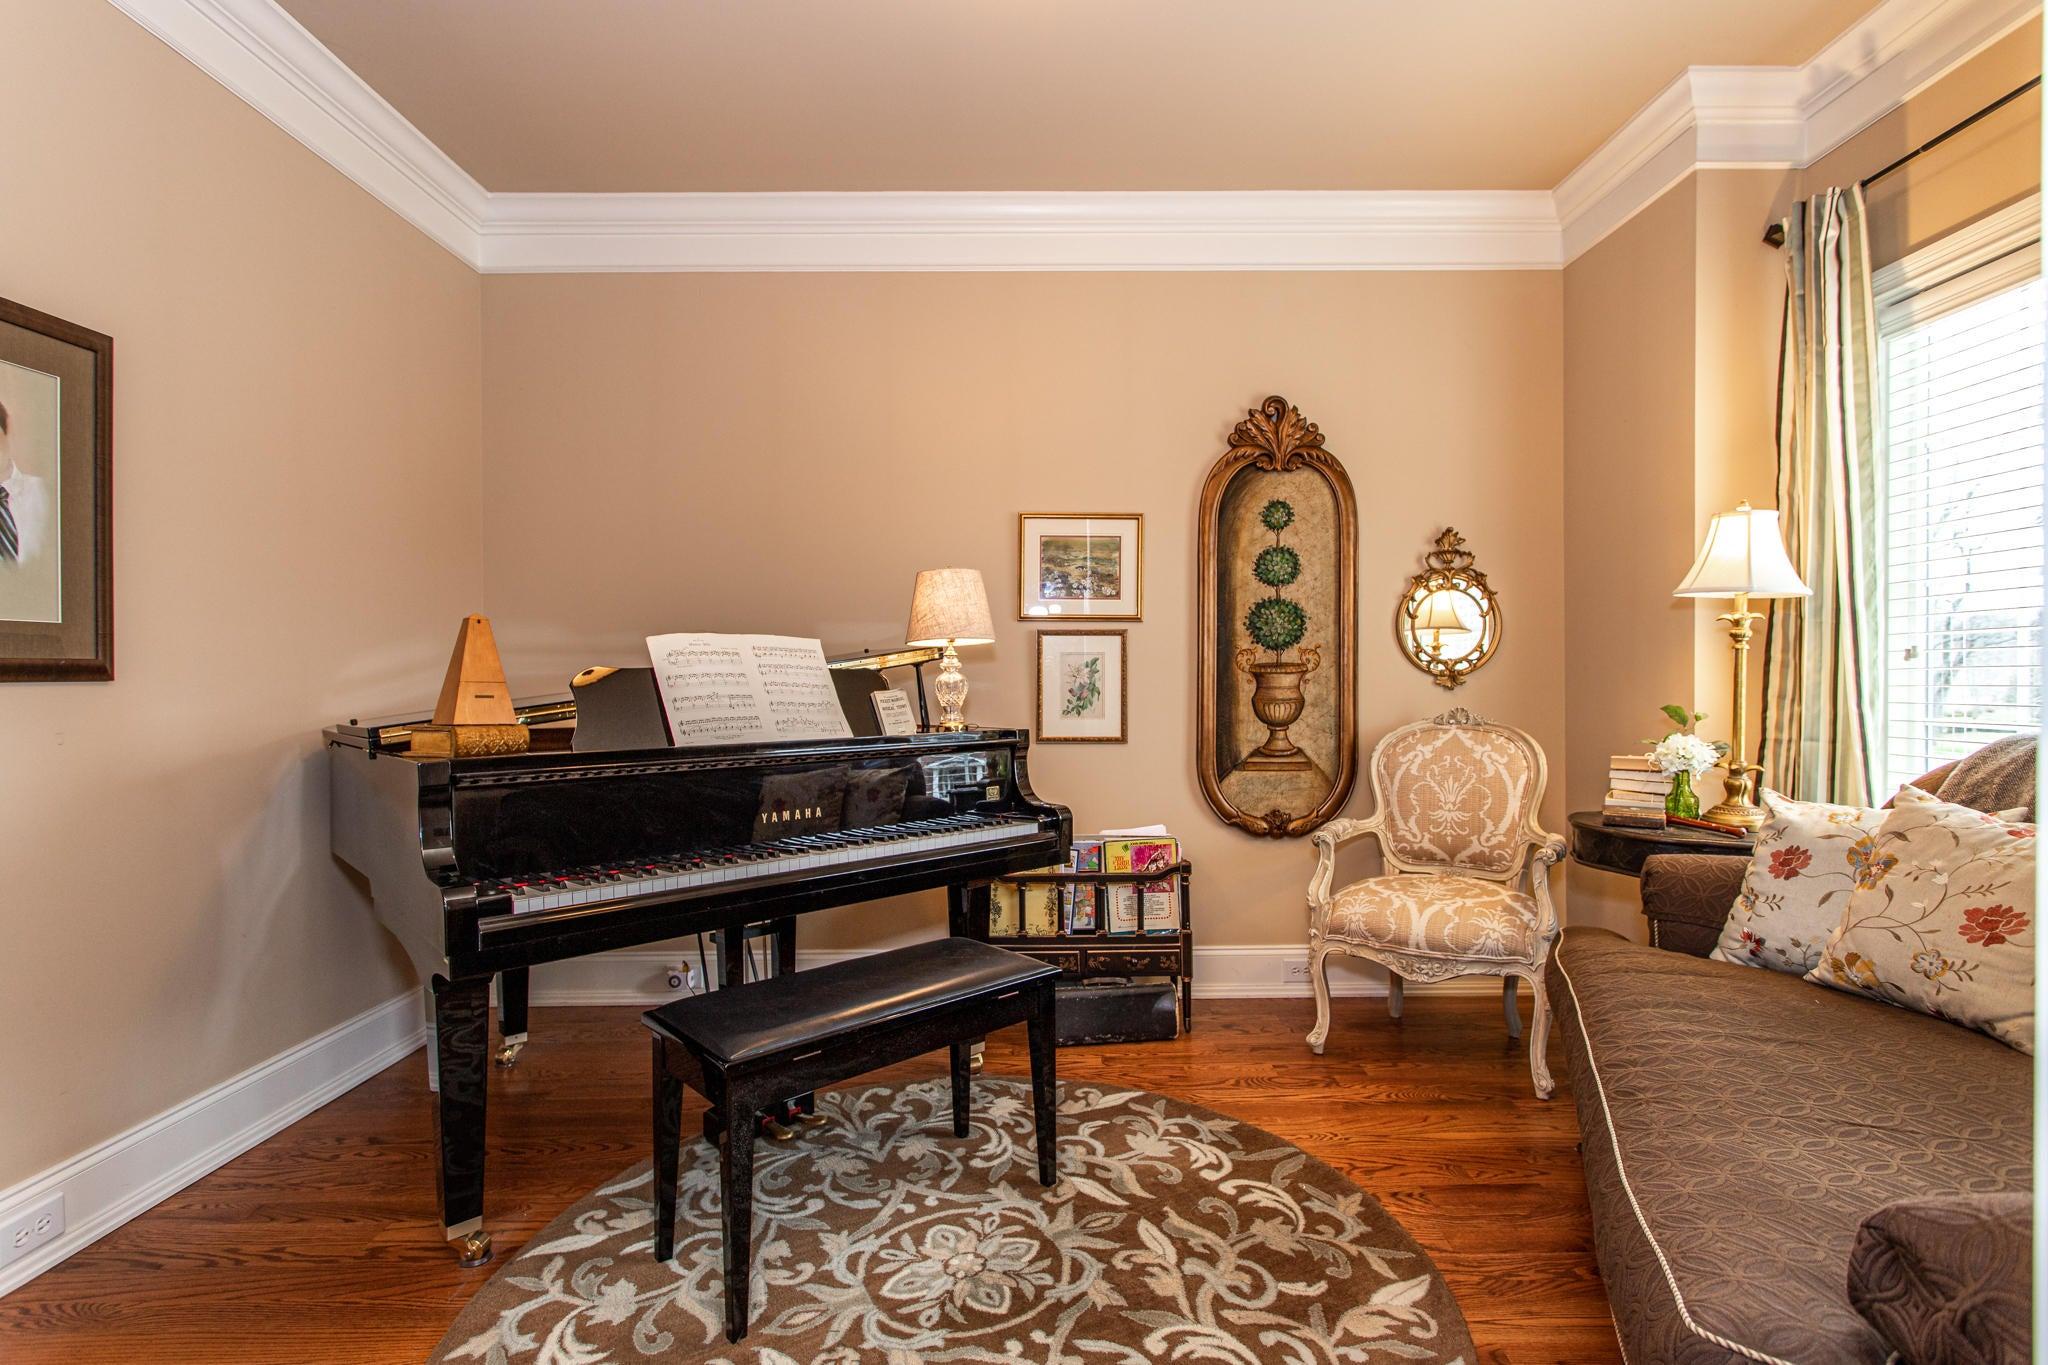 OFFICE/MUSIC ROOM/LIVING ROOM